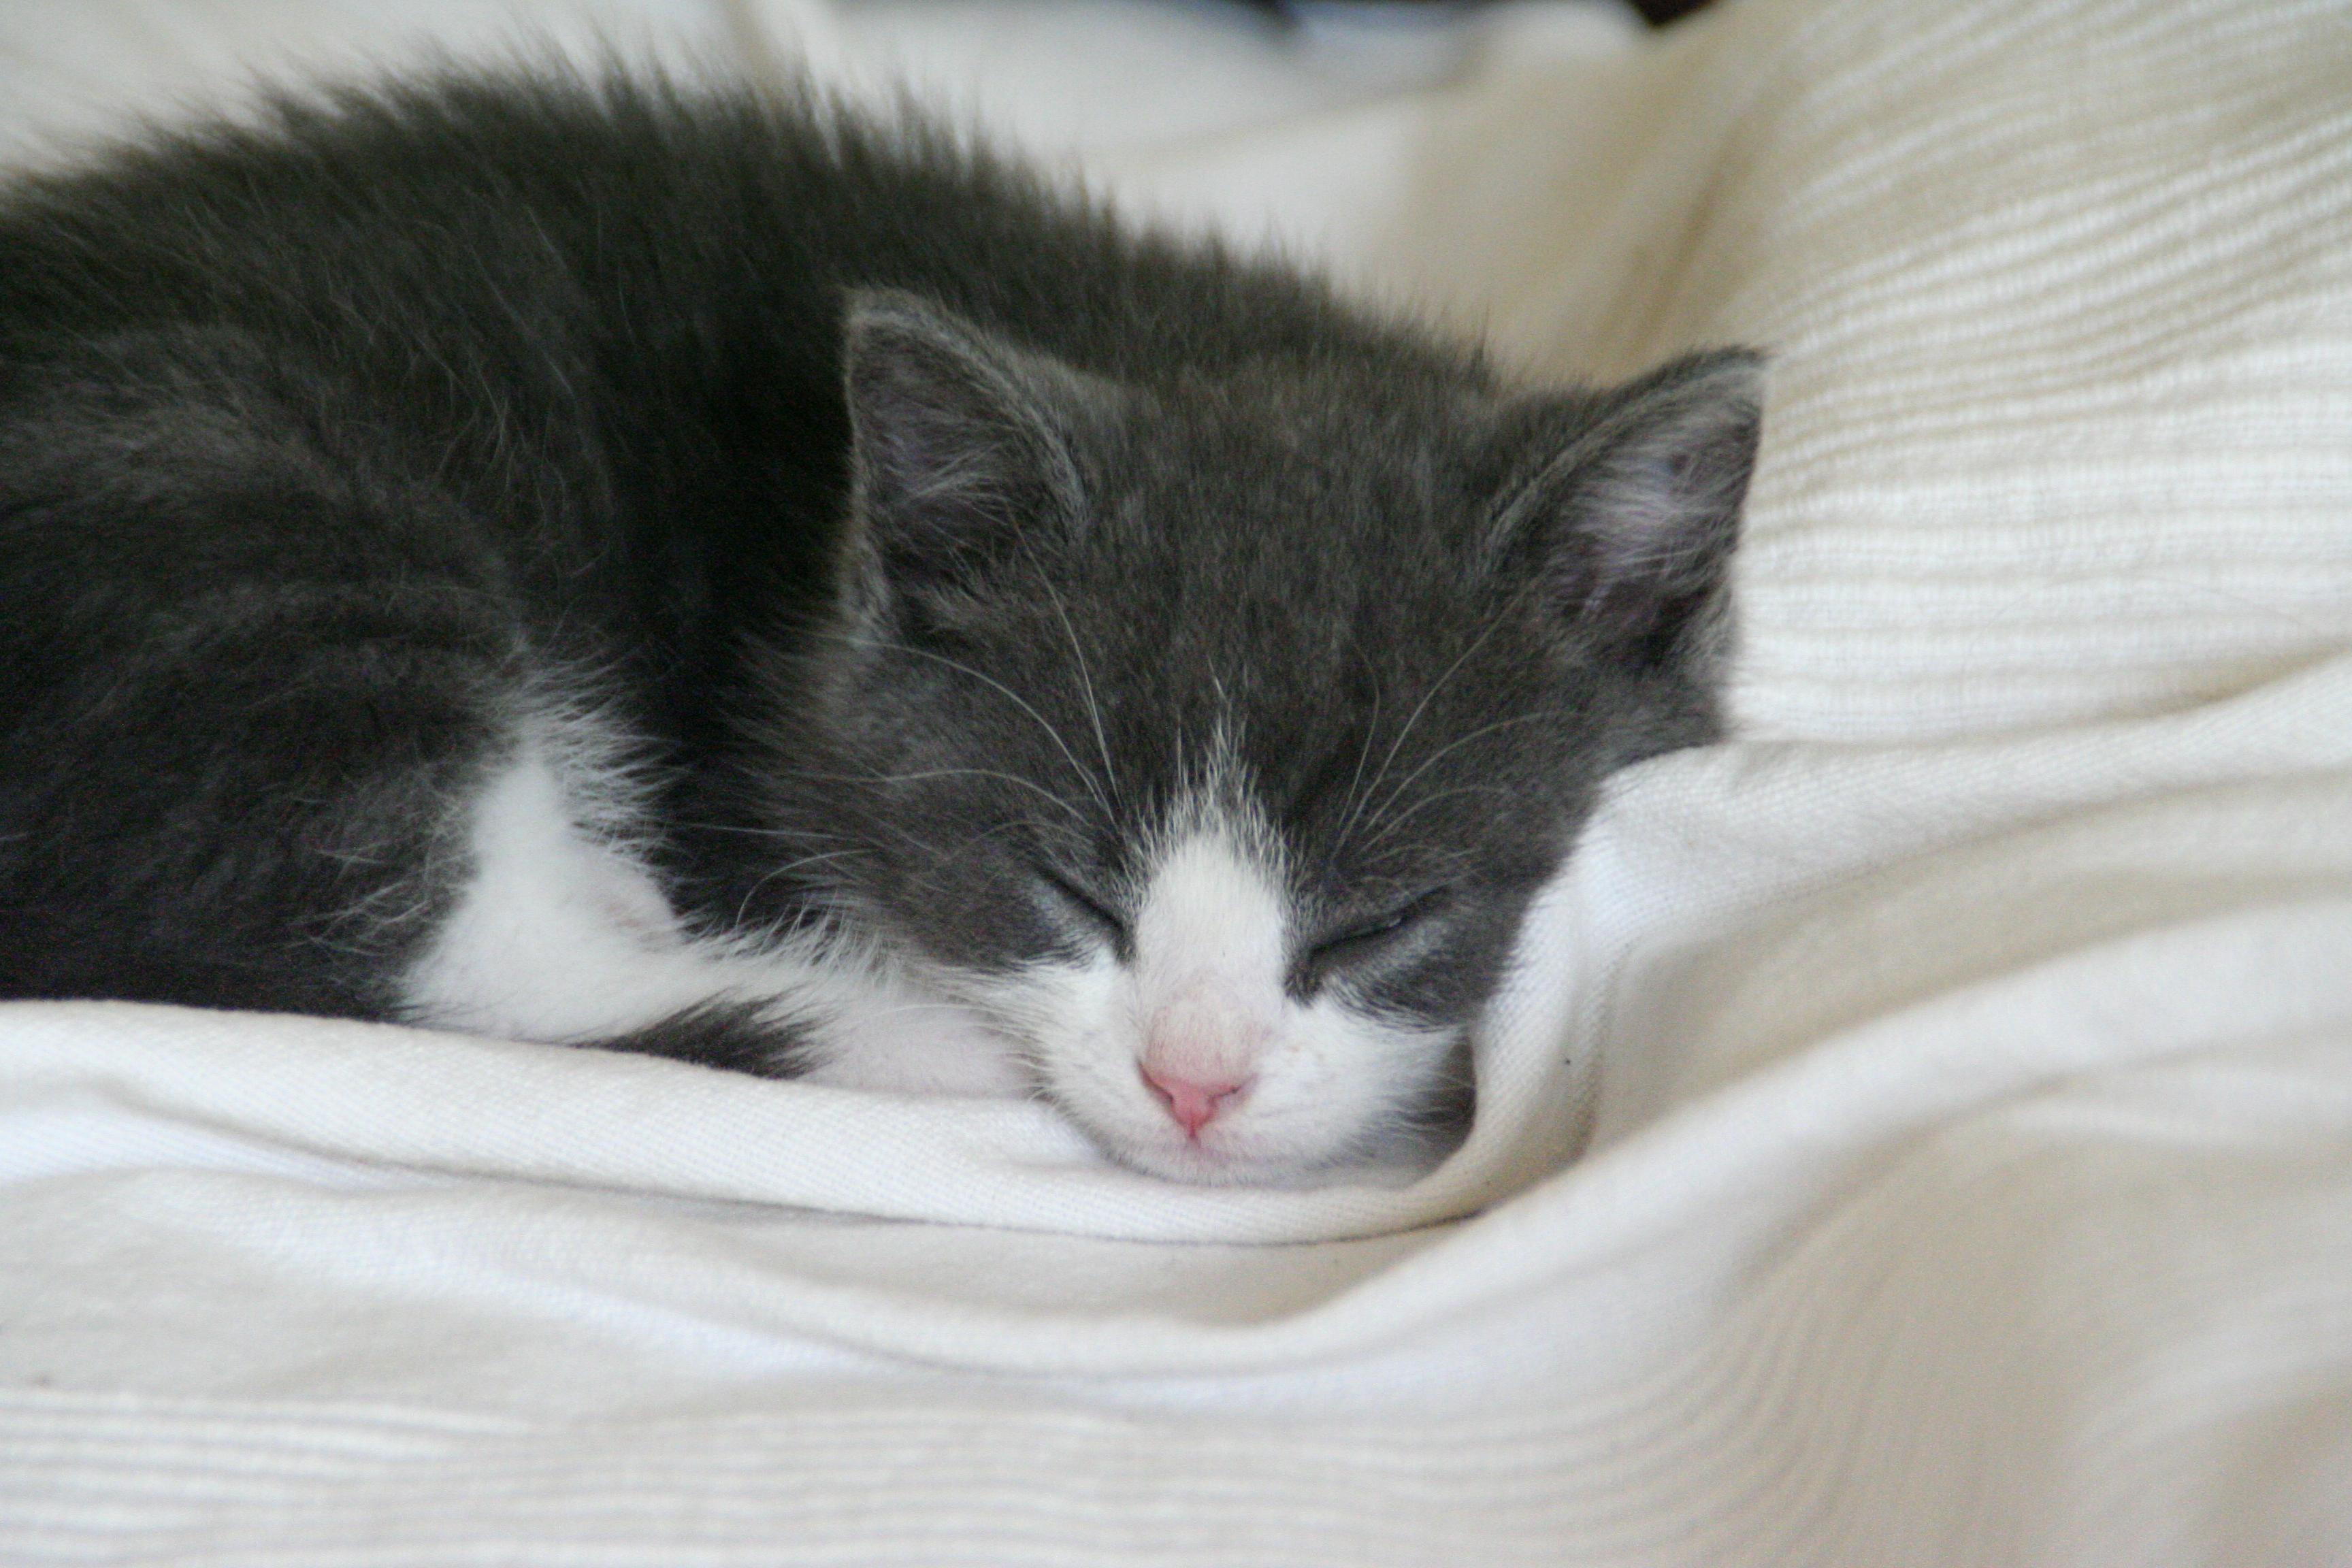 Sleeping Siamese kittens photo and wallpaper. Beautiful Sleeping ...